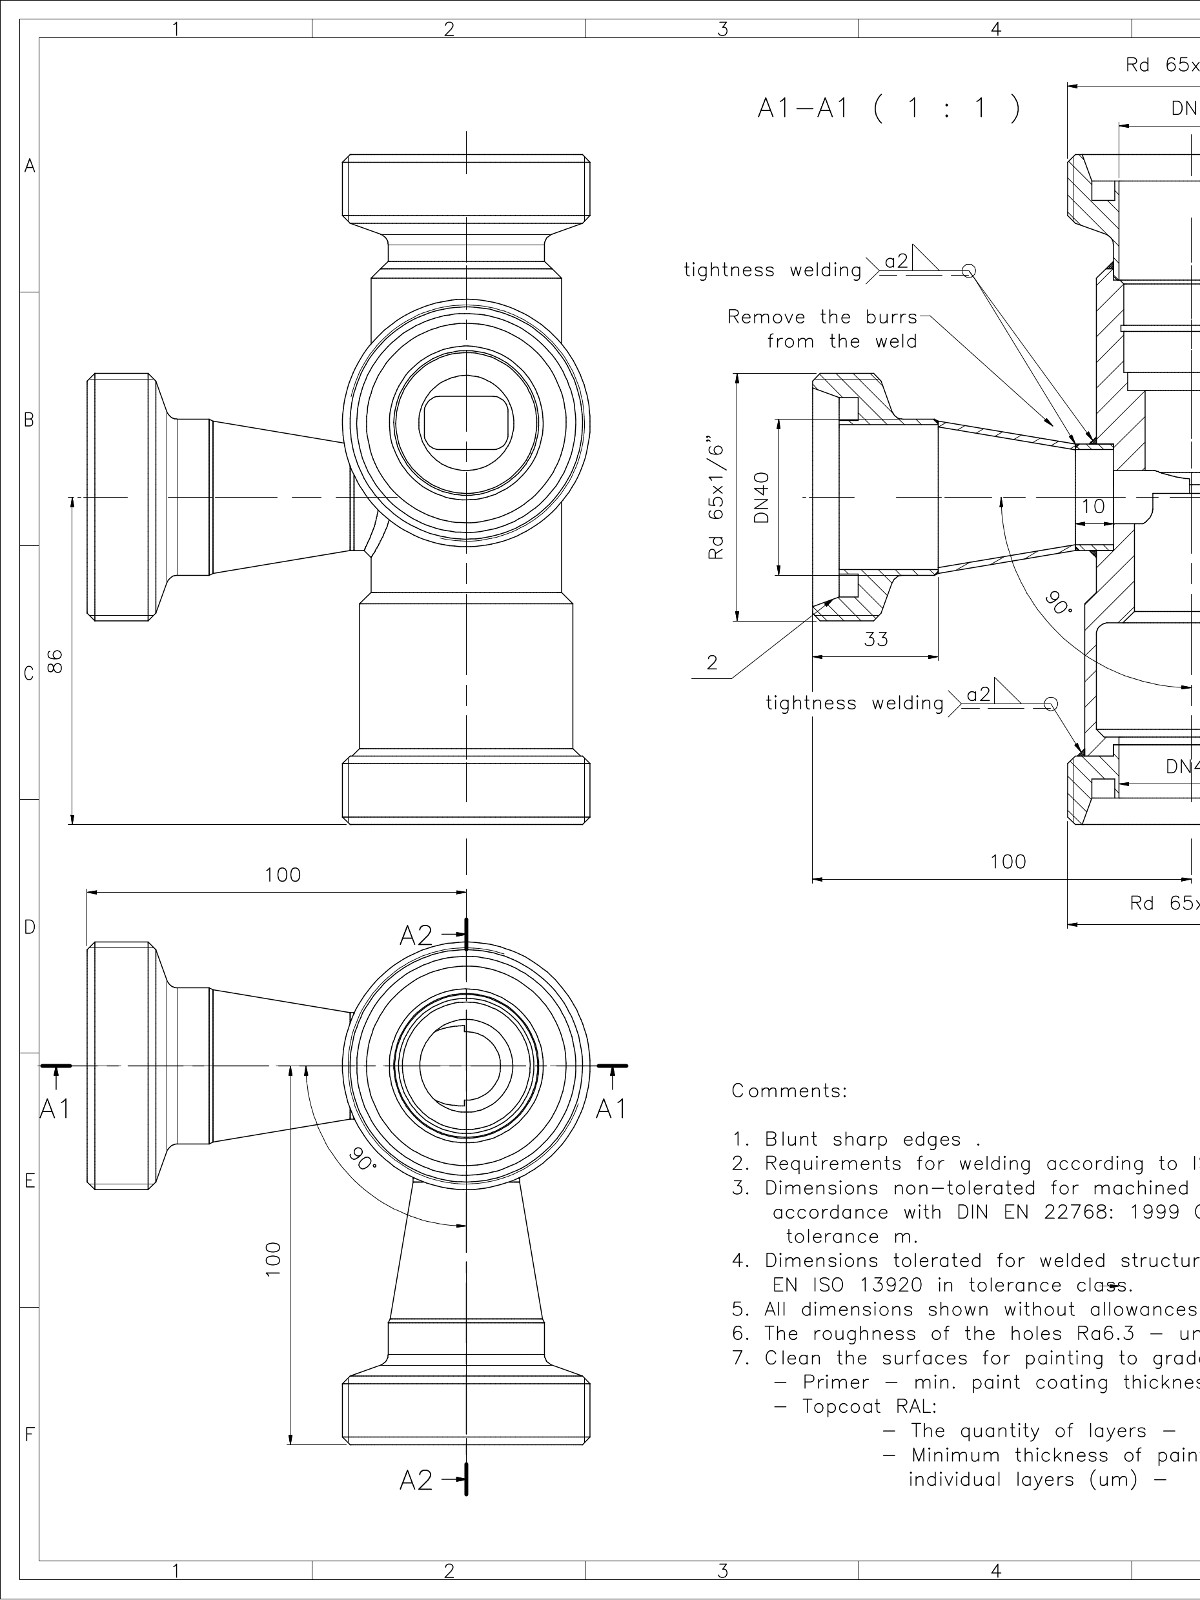 Autocad 3d House Design Software: Most Design Ideas 3d Cad House Design Pictures, And